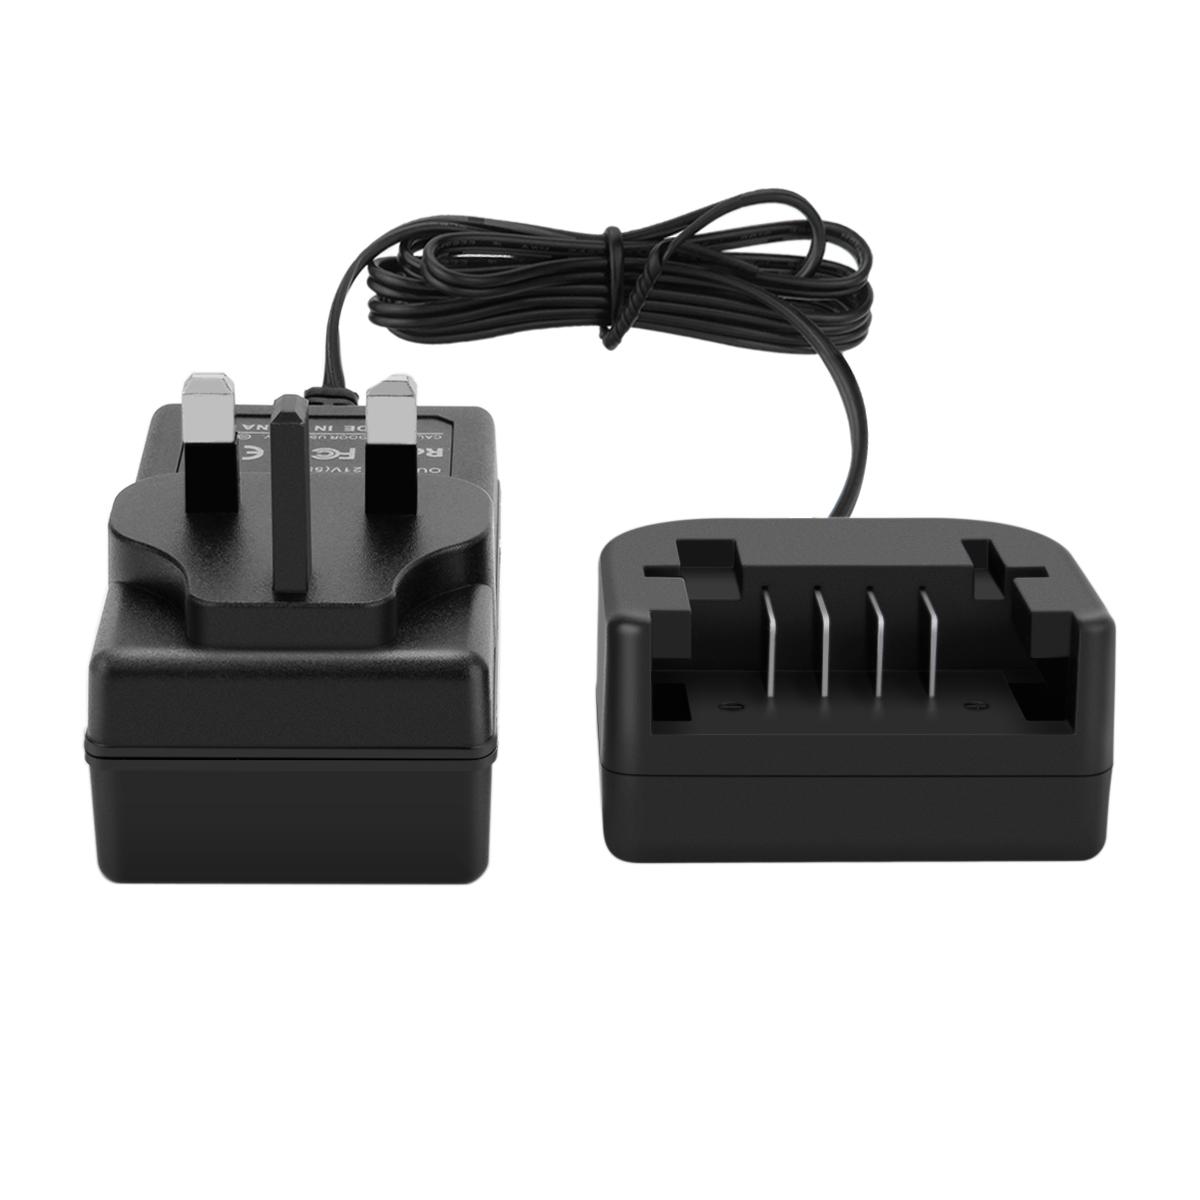 18V//20V Li-Ion Akku Ladegerät für Black /& Decker LBX20 LBXR20 LB20 LB2X4020-OPE